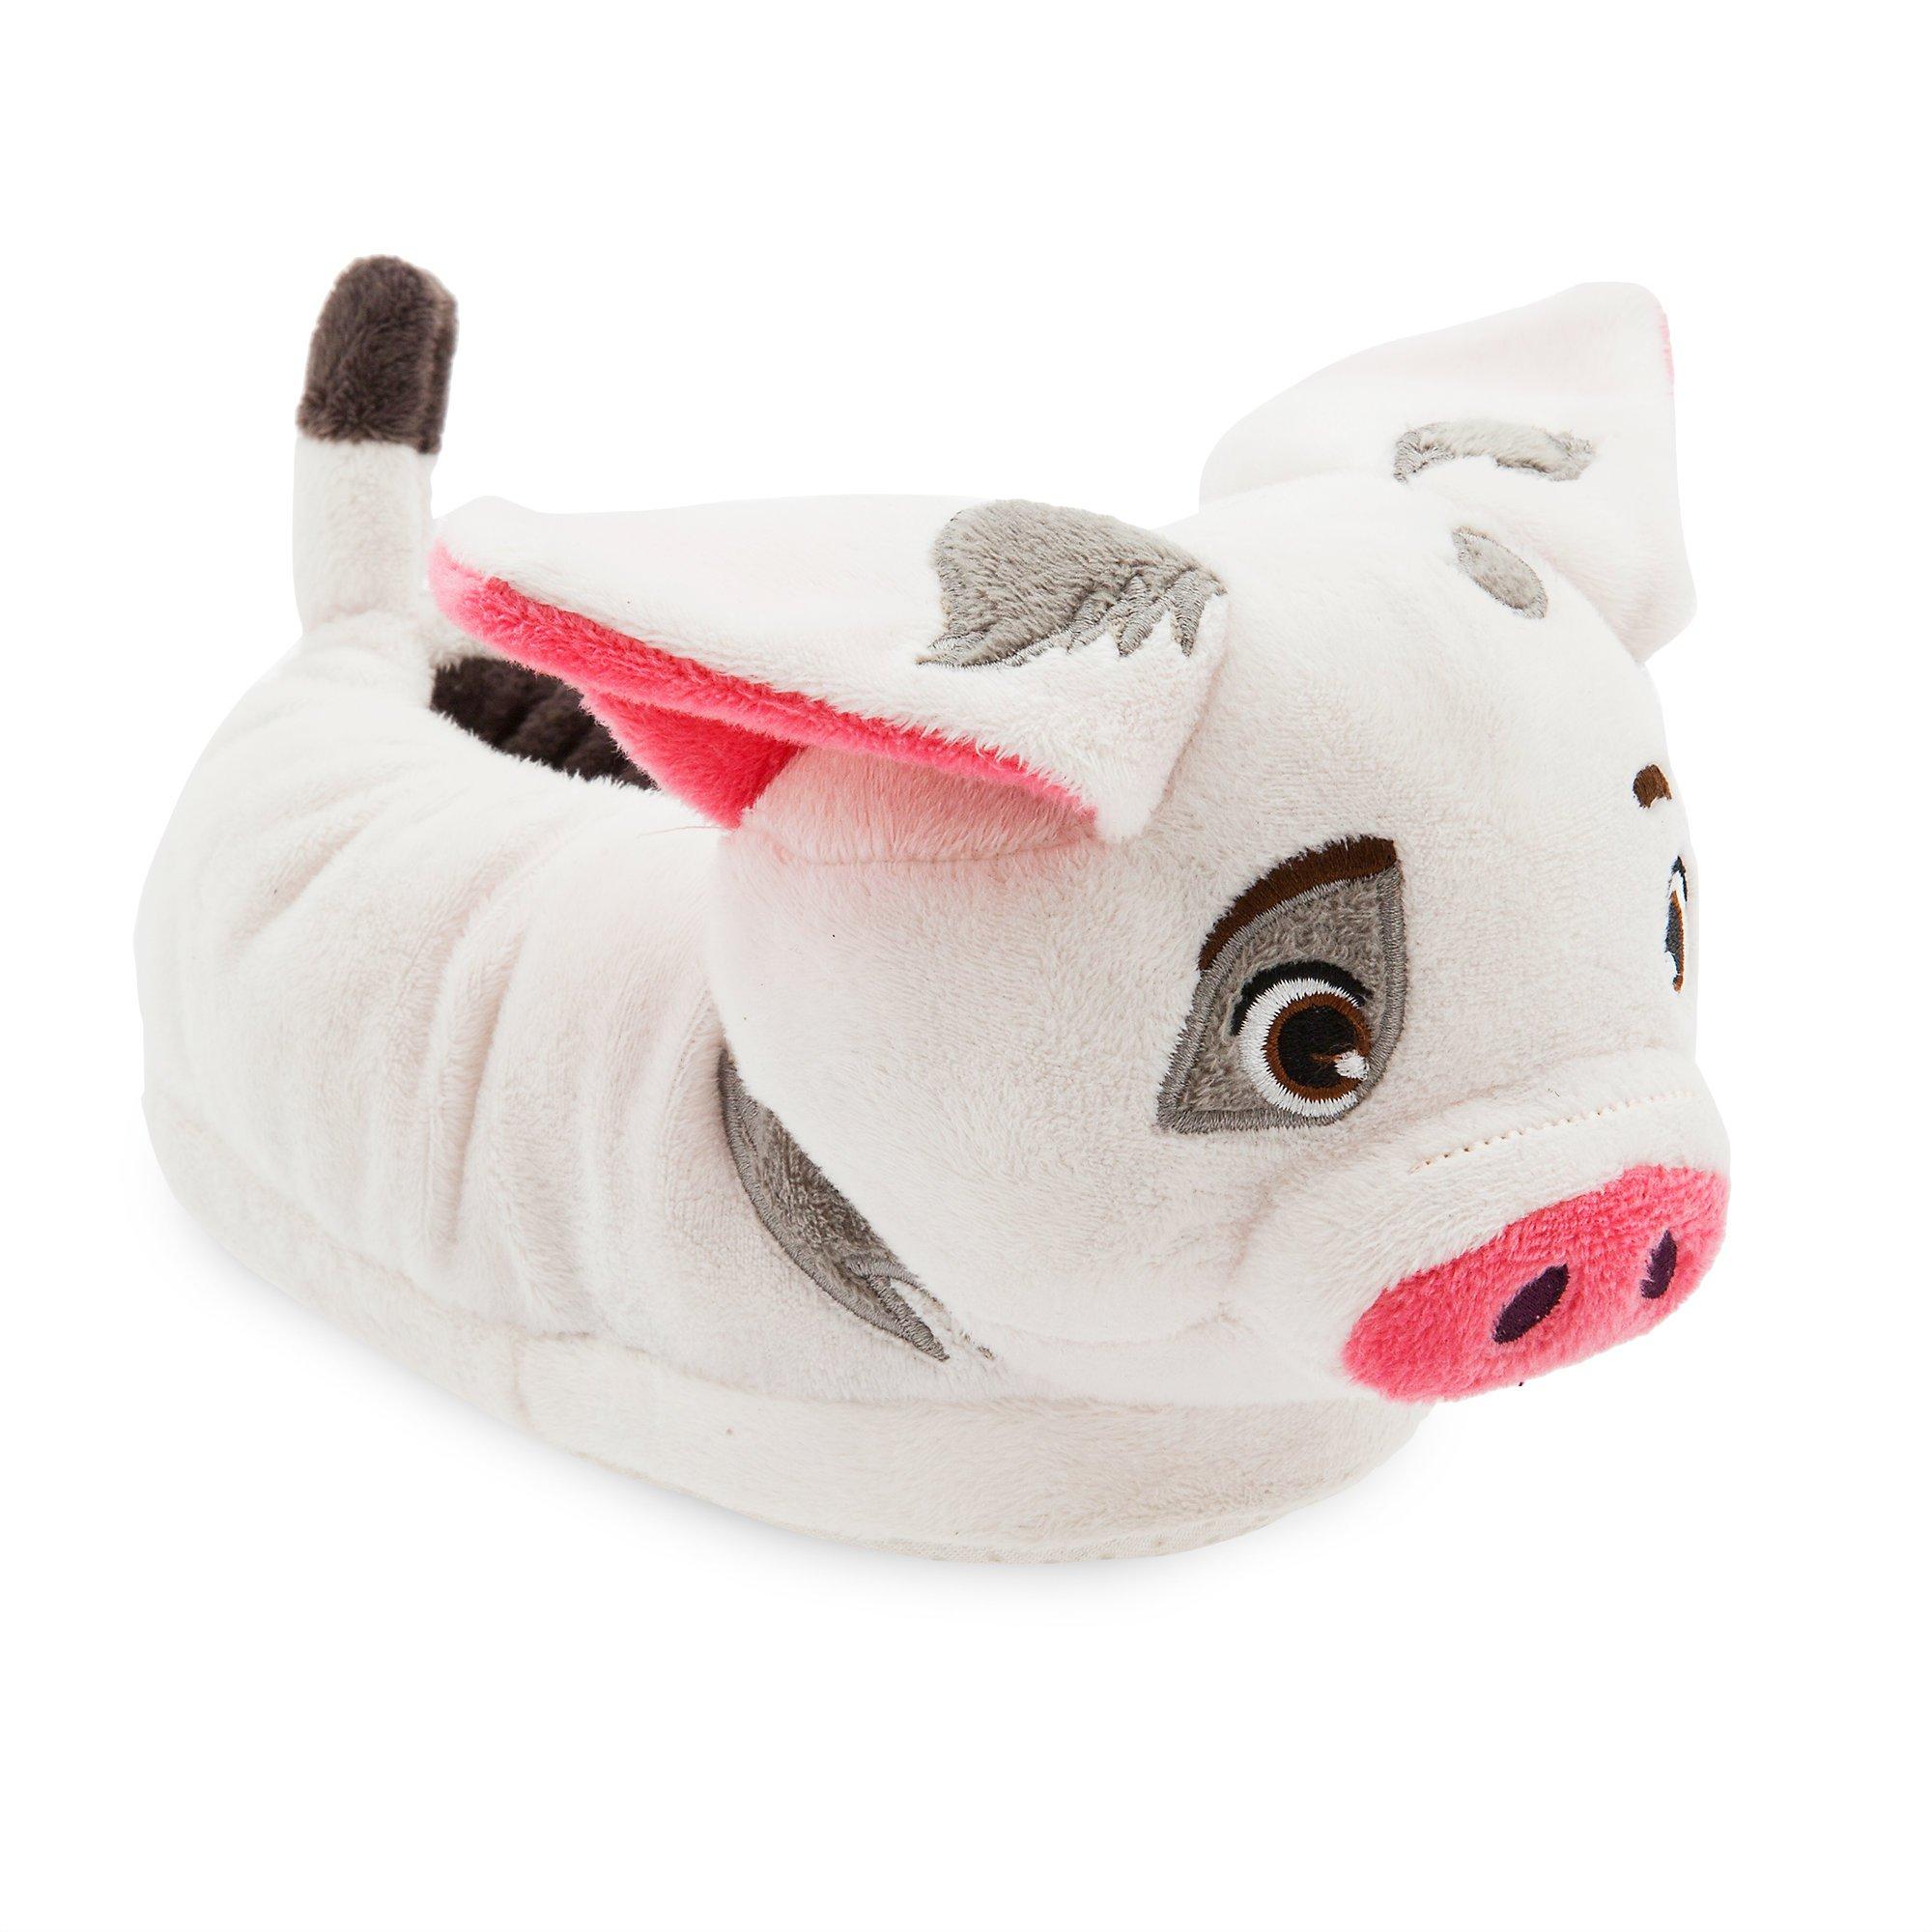 Disney Pua Slippers for Kids - Moana,White,11/12 YTH